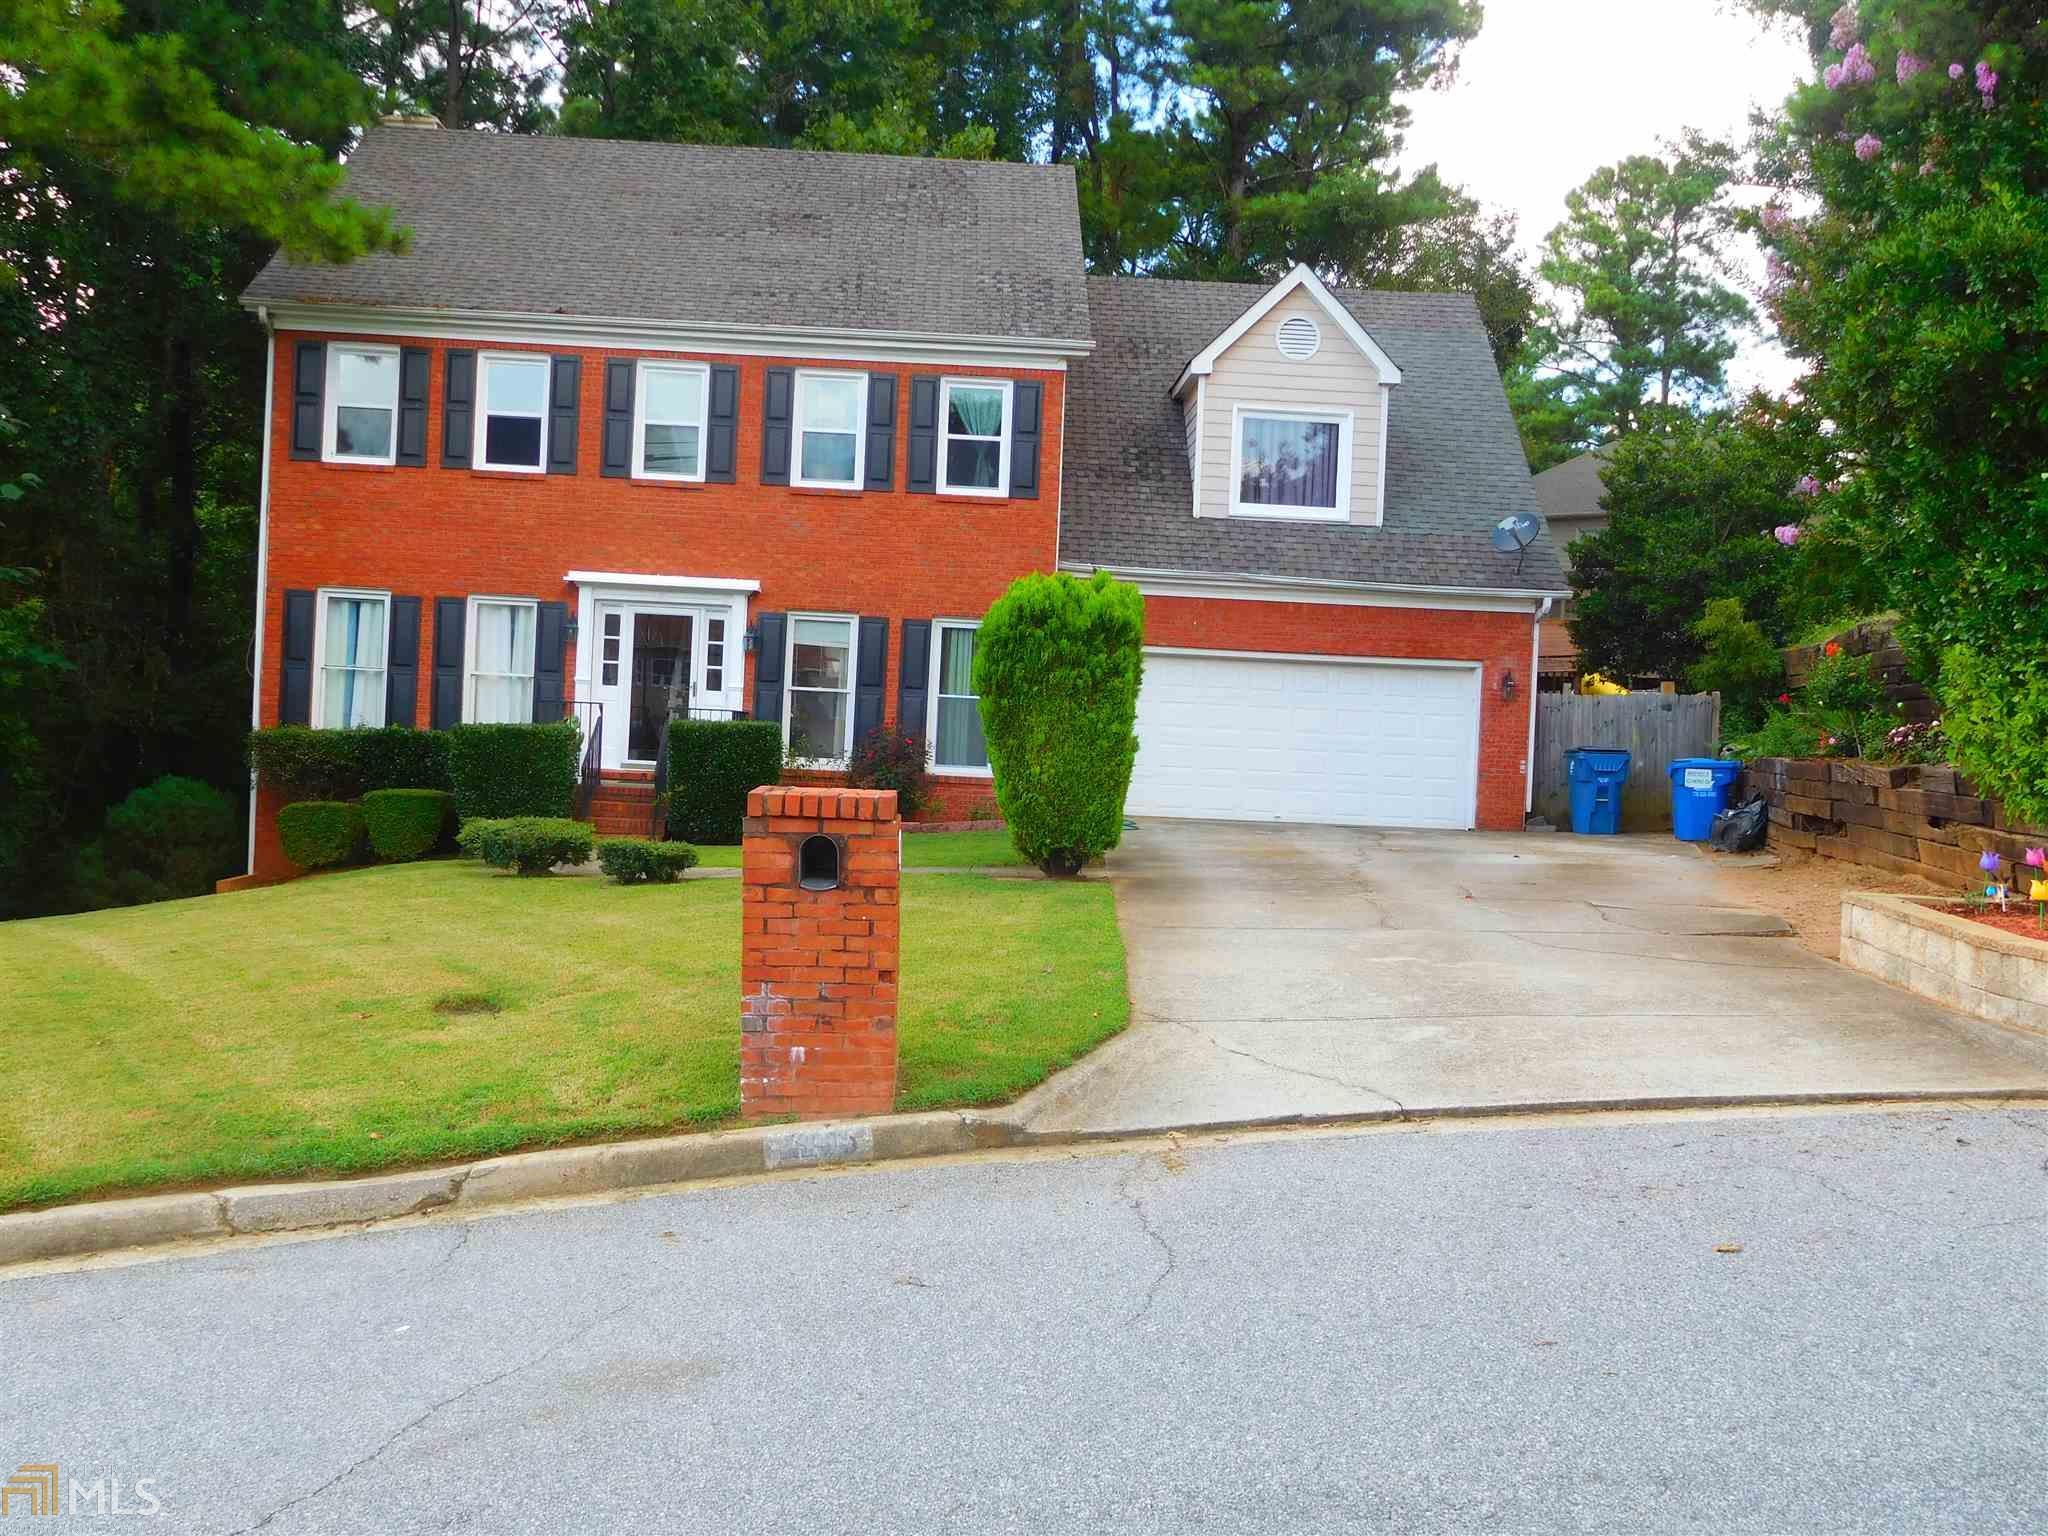 2295 Mint Julep Ct, Lawrenceville, GA | MLS# 8423771